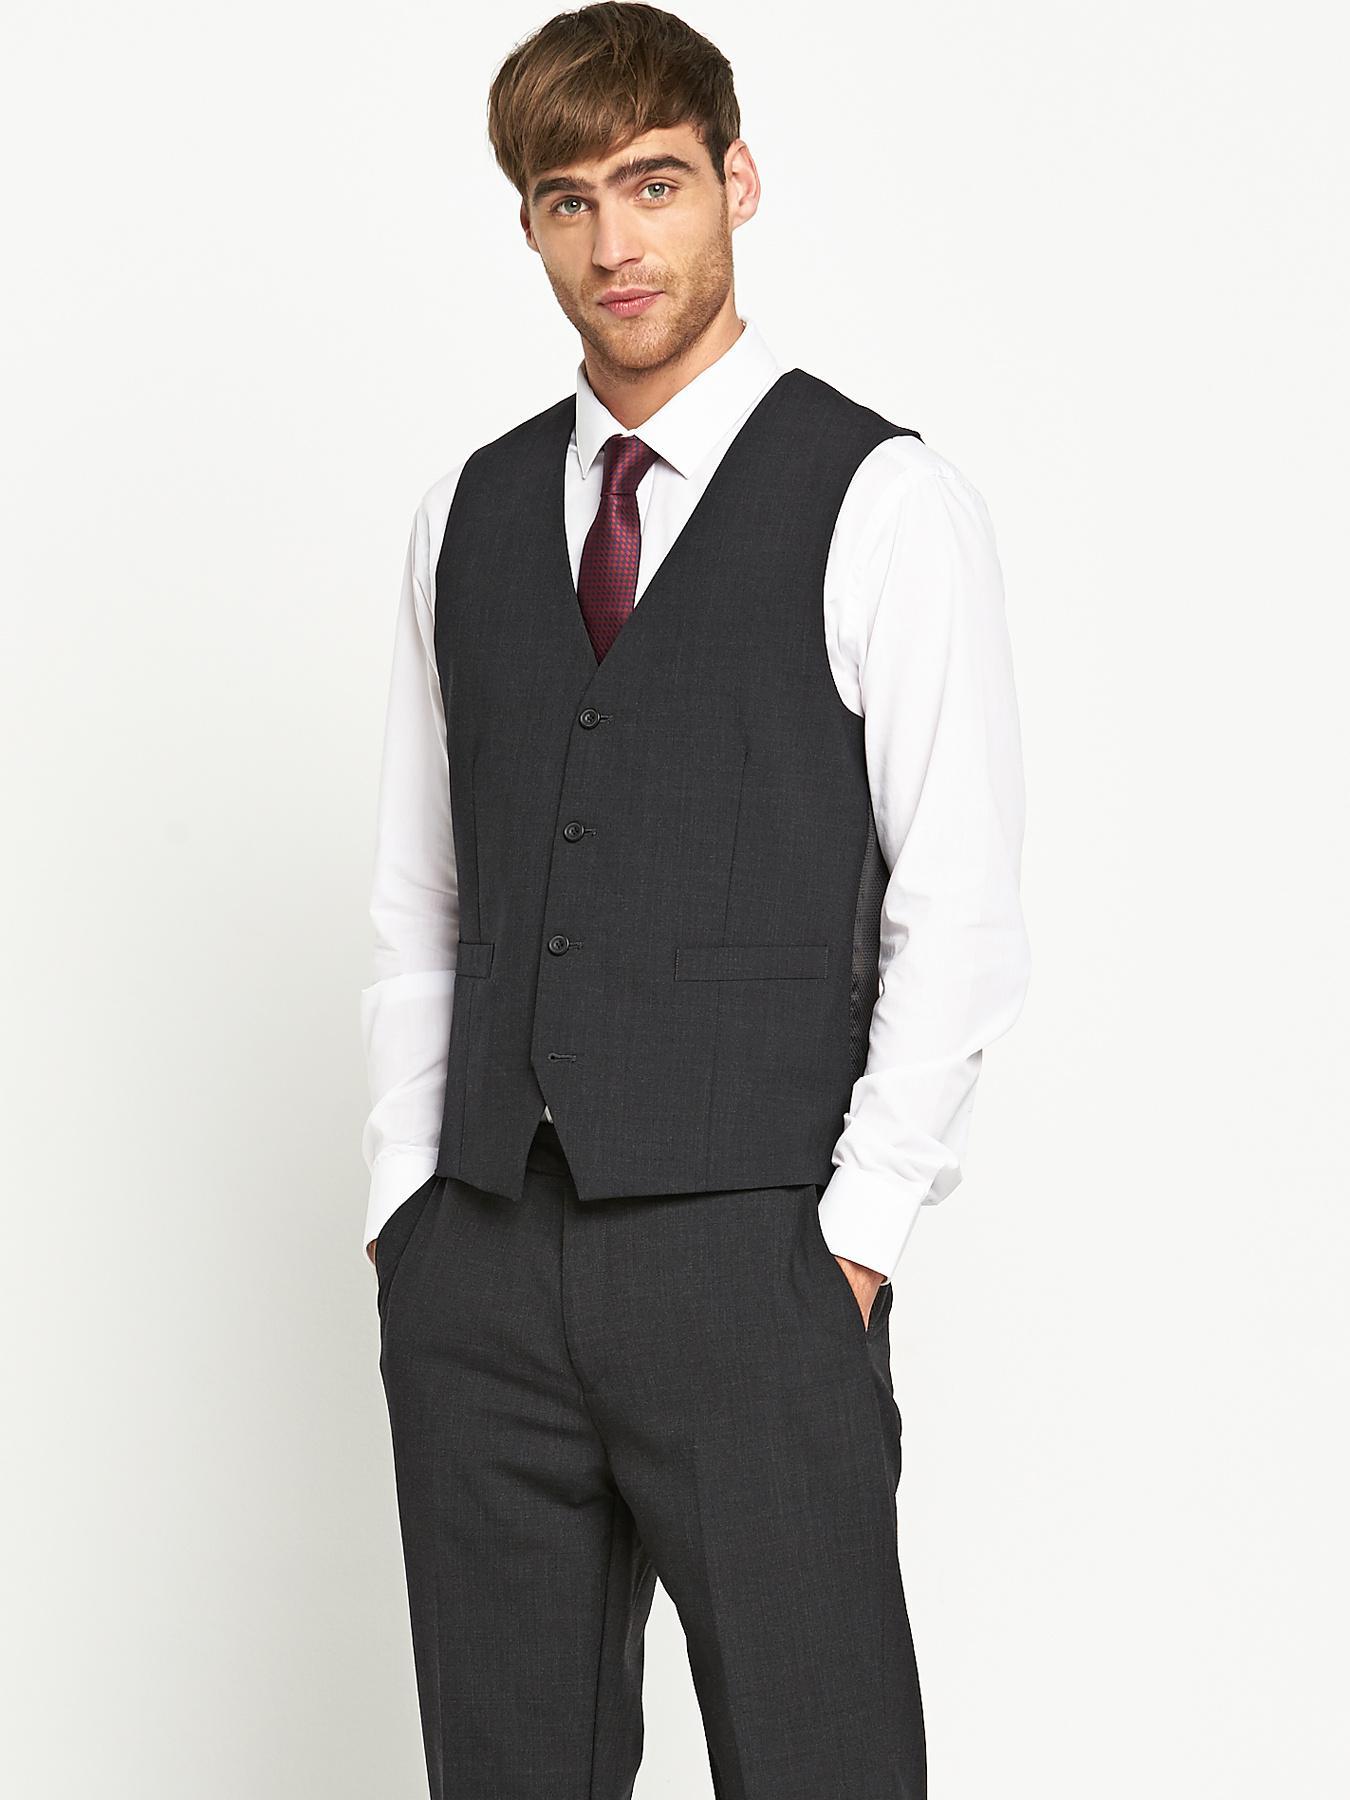 Mens Otis Suit Waistcoat - Charcoal, Charcoal at Littlewoods